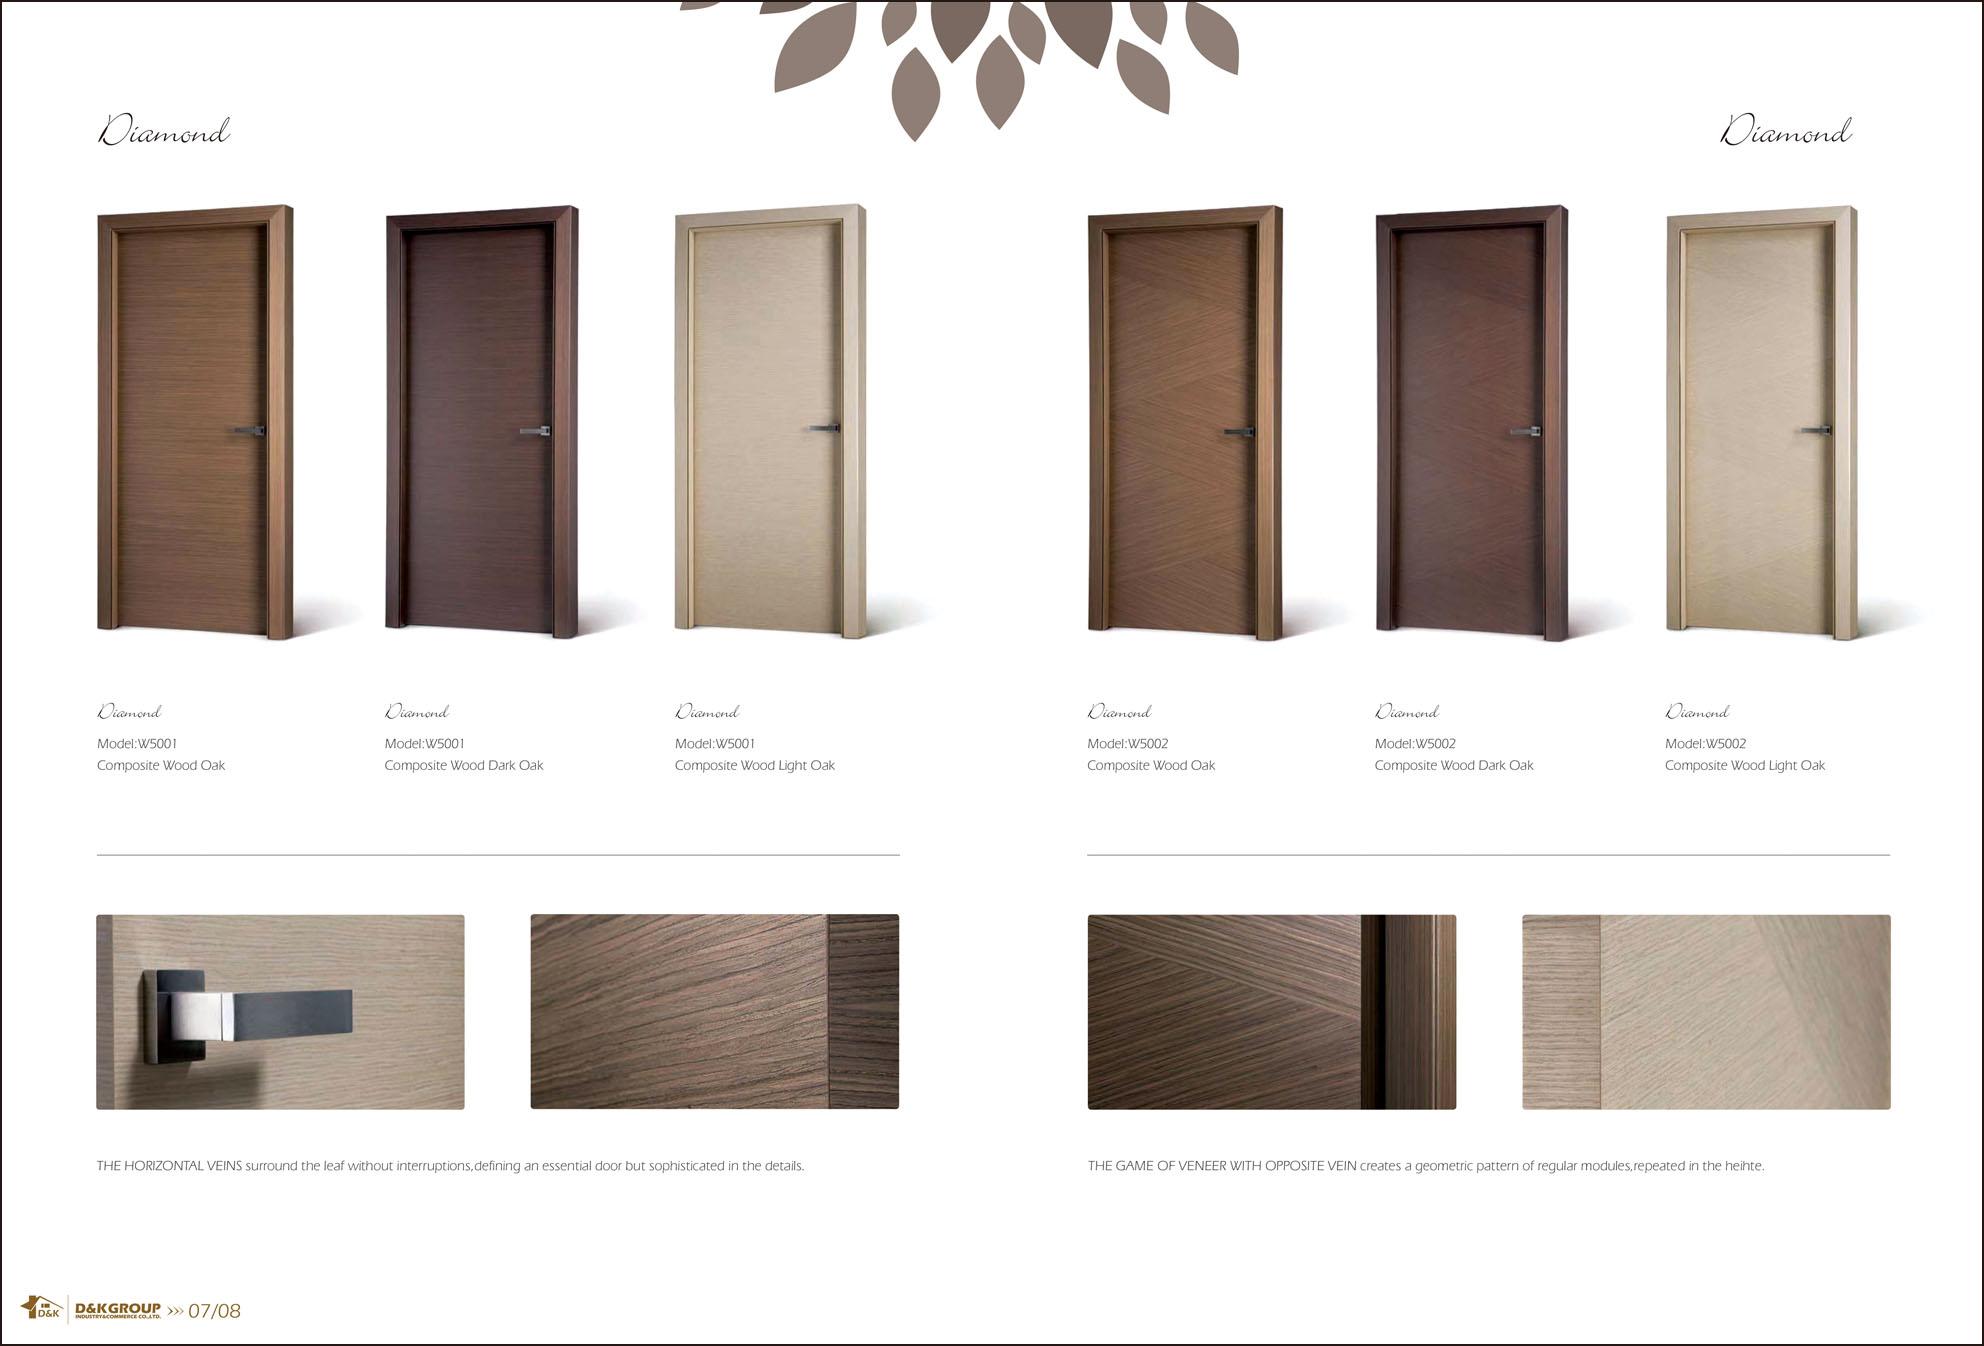 Wooden Bedroom 卧室门颜色 卧室门颜色风水禁忌 装修卧室门颜色 卧室门一般用什么颜色 卧室门的颜色和款式